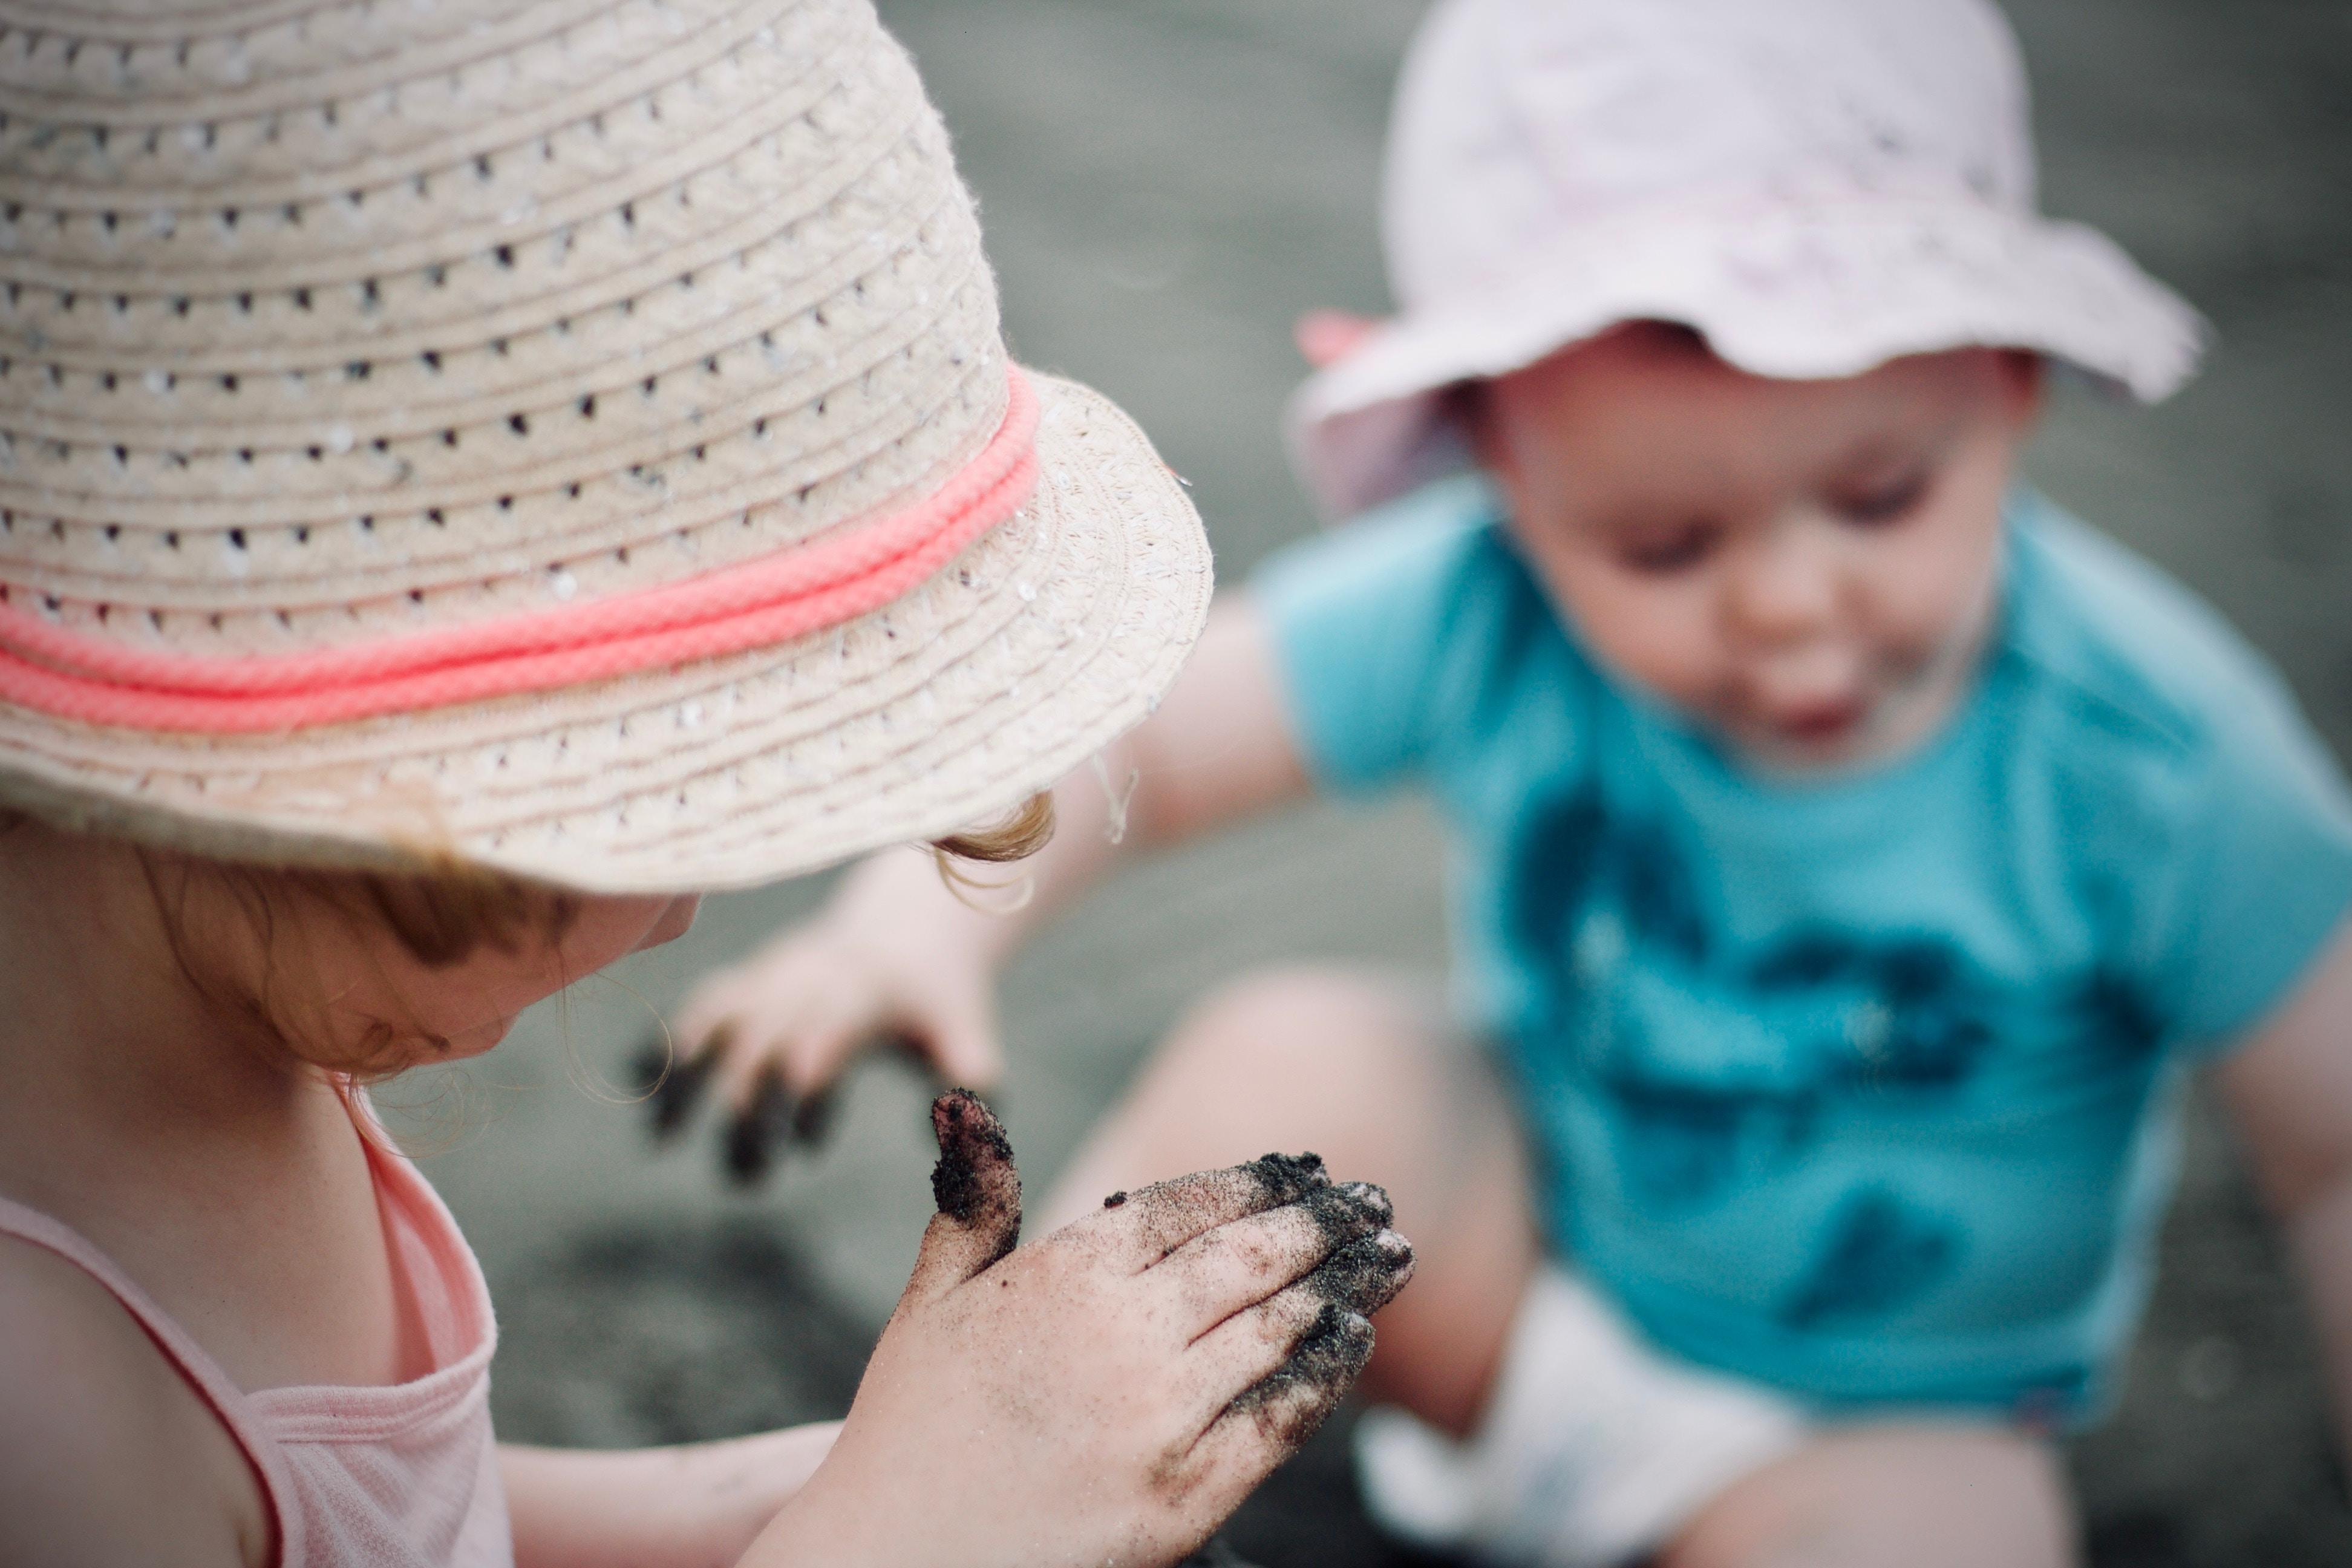 closeup photo of girl wearing sun hat holding sand